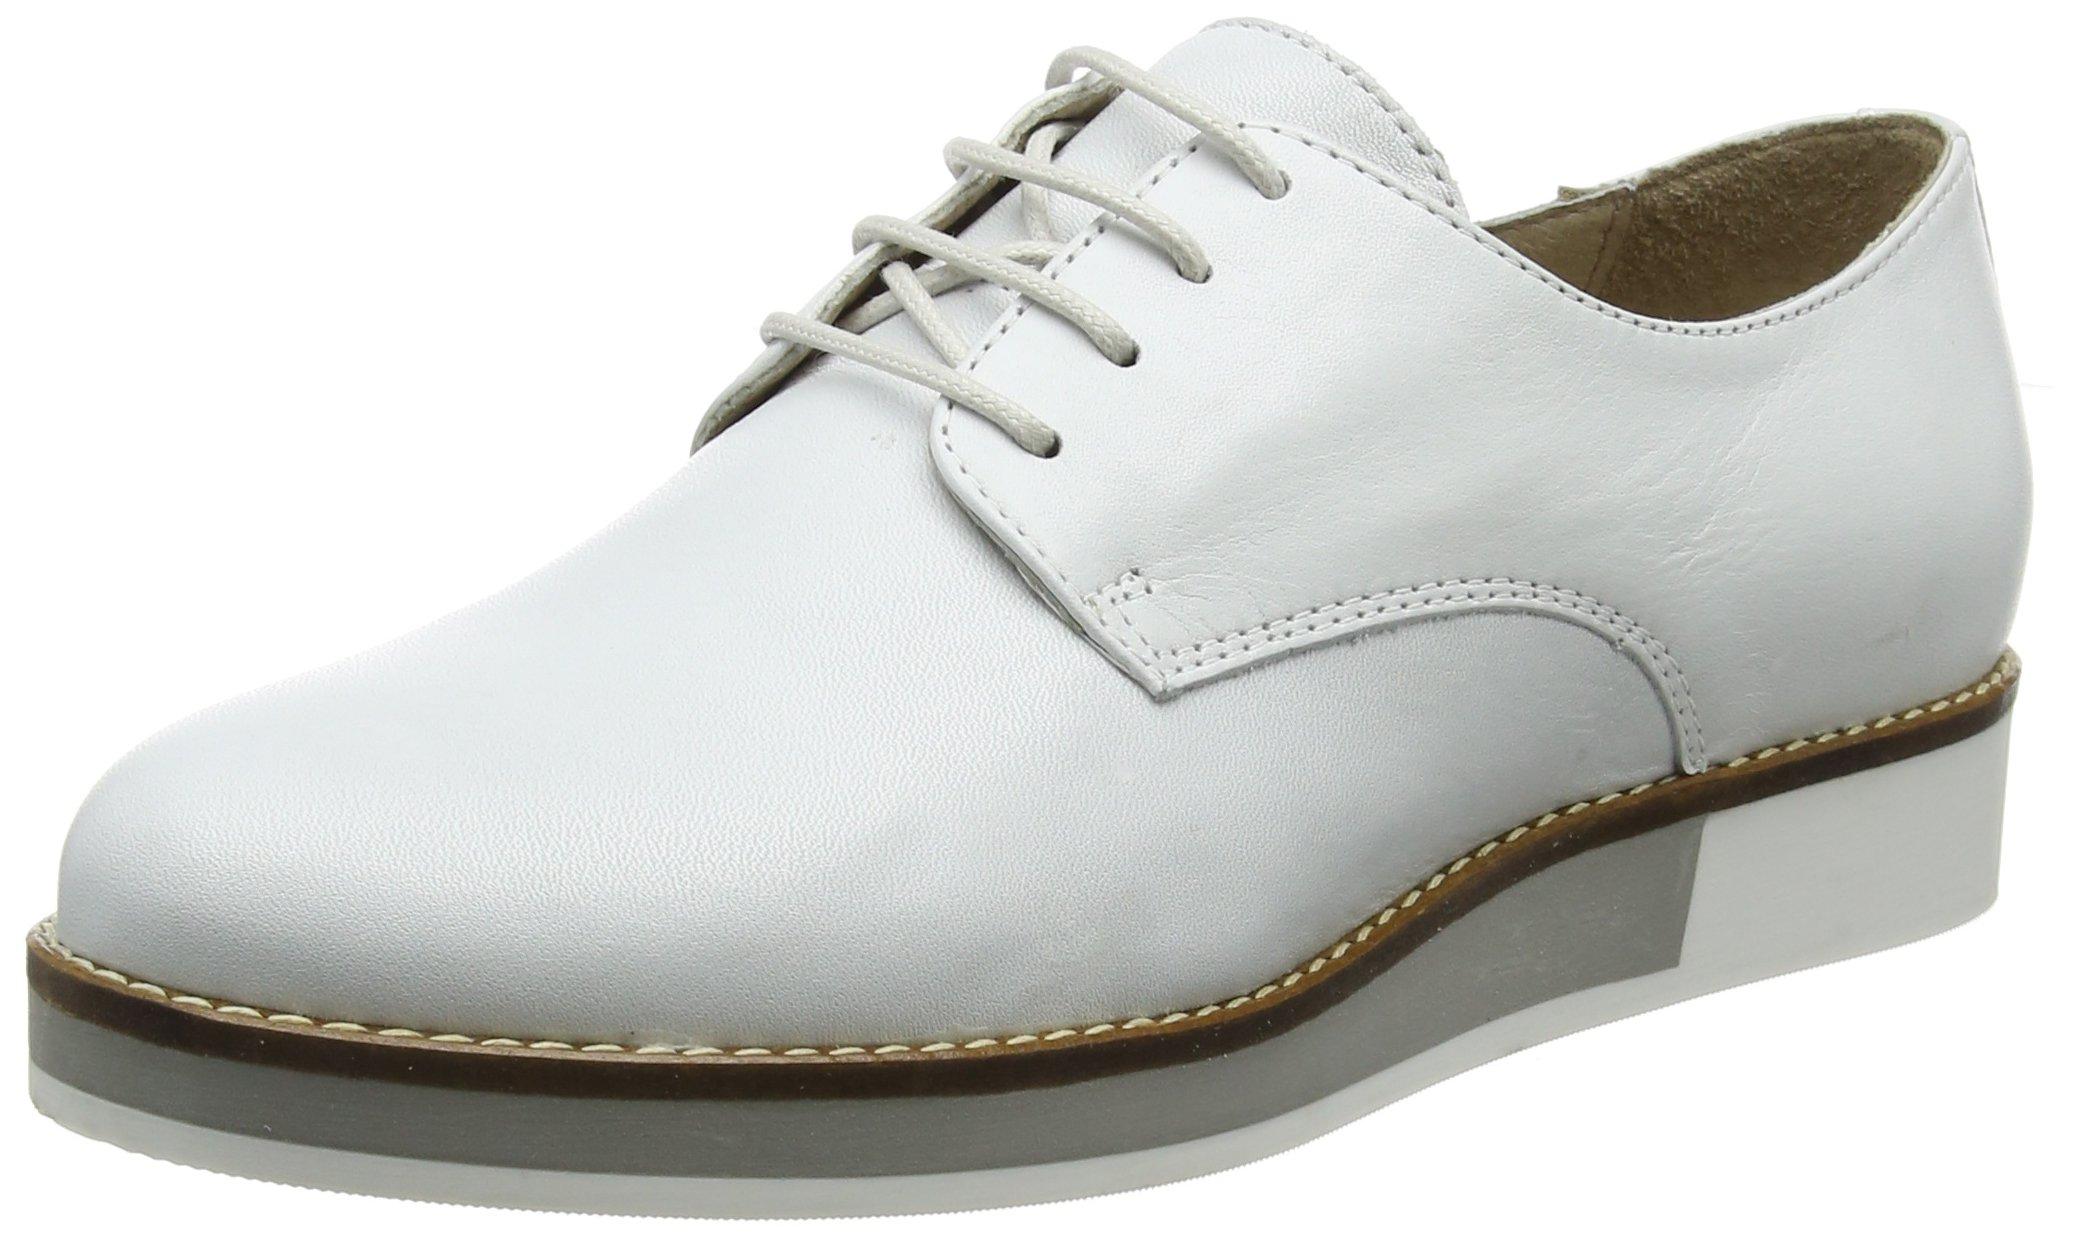 FemmeBlancwhite Lace Eu ShoesDerbys Up 8041 Bianco c34RqSLAj5